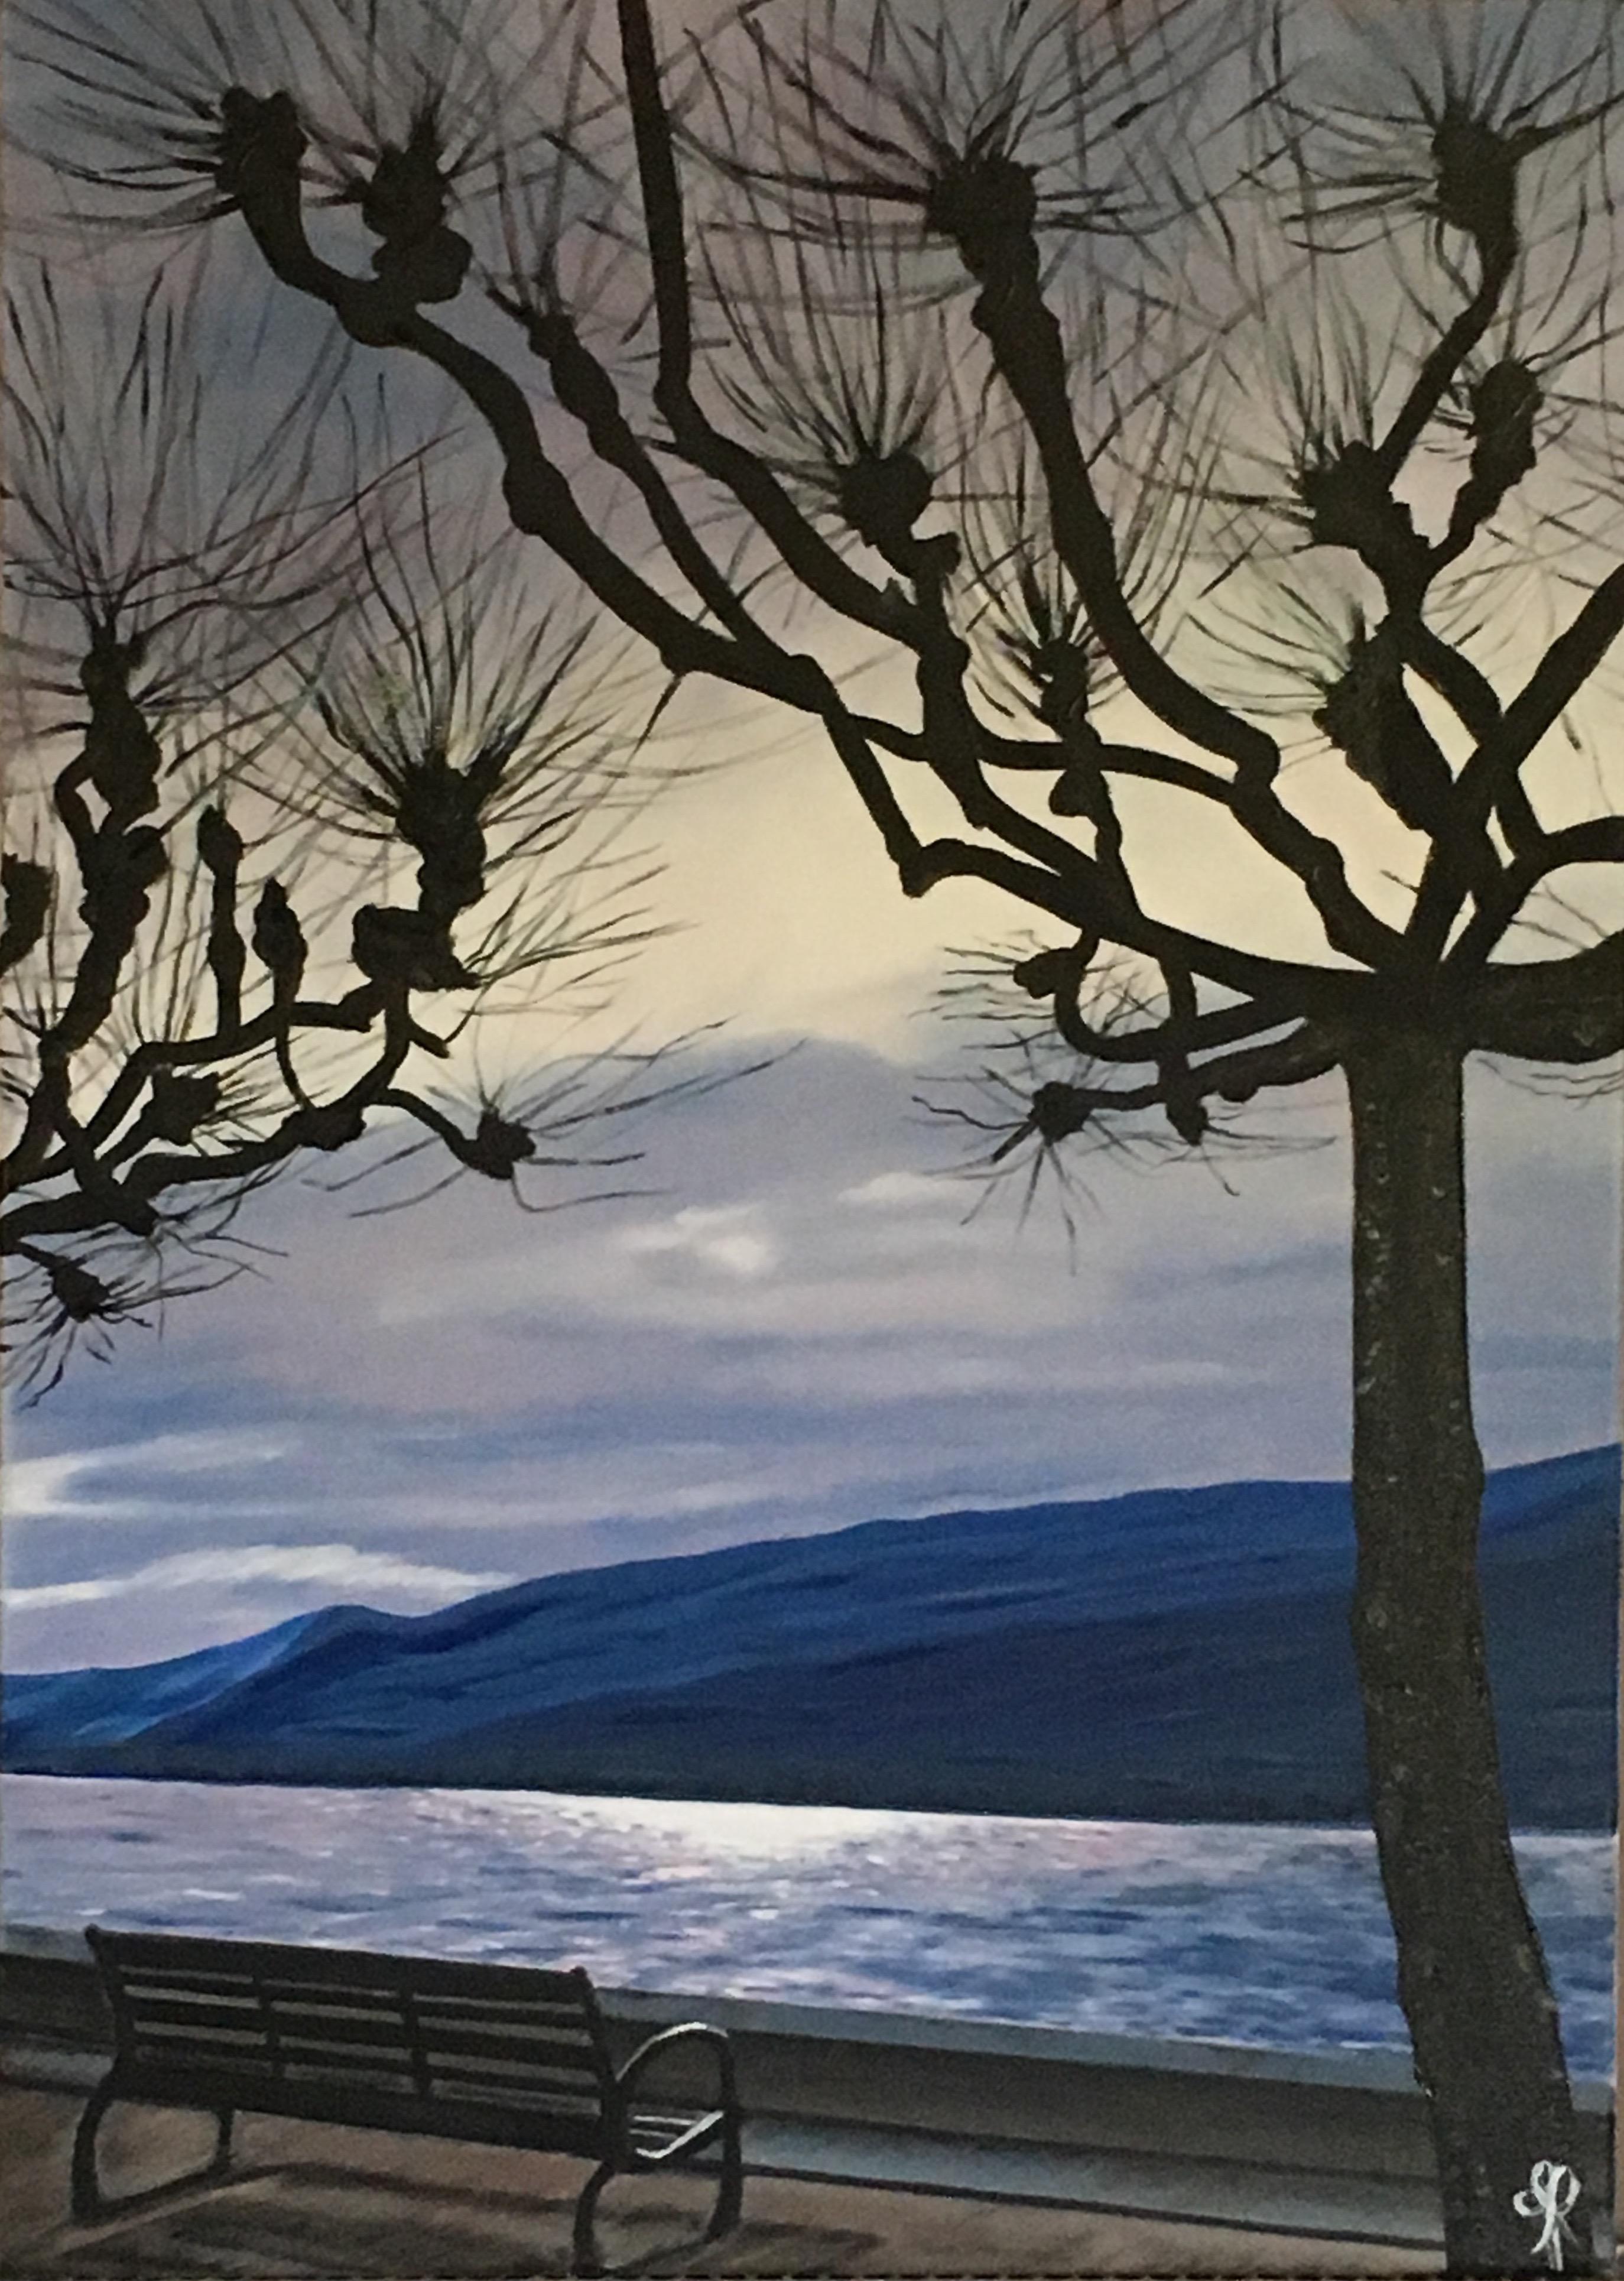 Le Bourget's lake at nightfall - oil painting